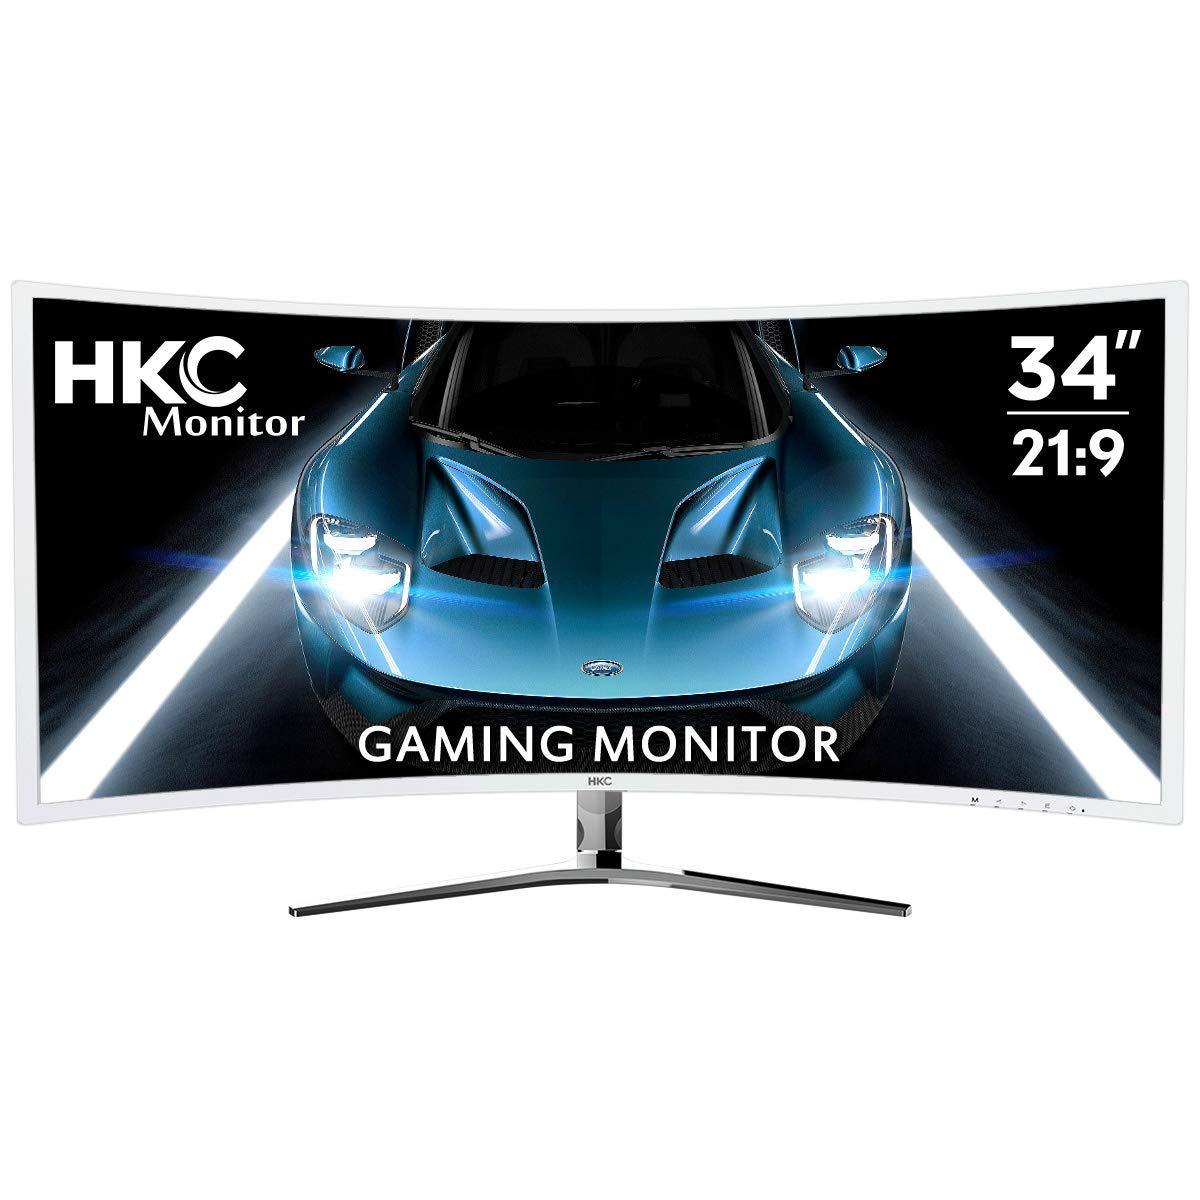 HKC 34-inch Curved 21 9 Ultrawide 3440x1440p QHD Professional Gaming Monitor 100Hz AMD FreeSync PIP Display